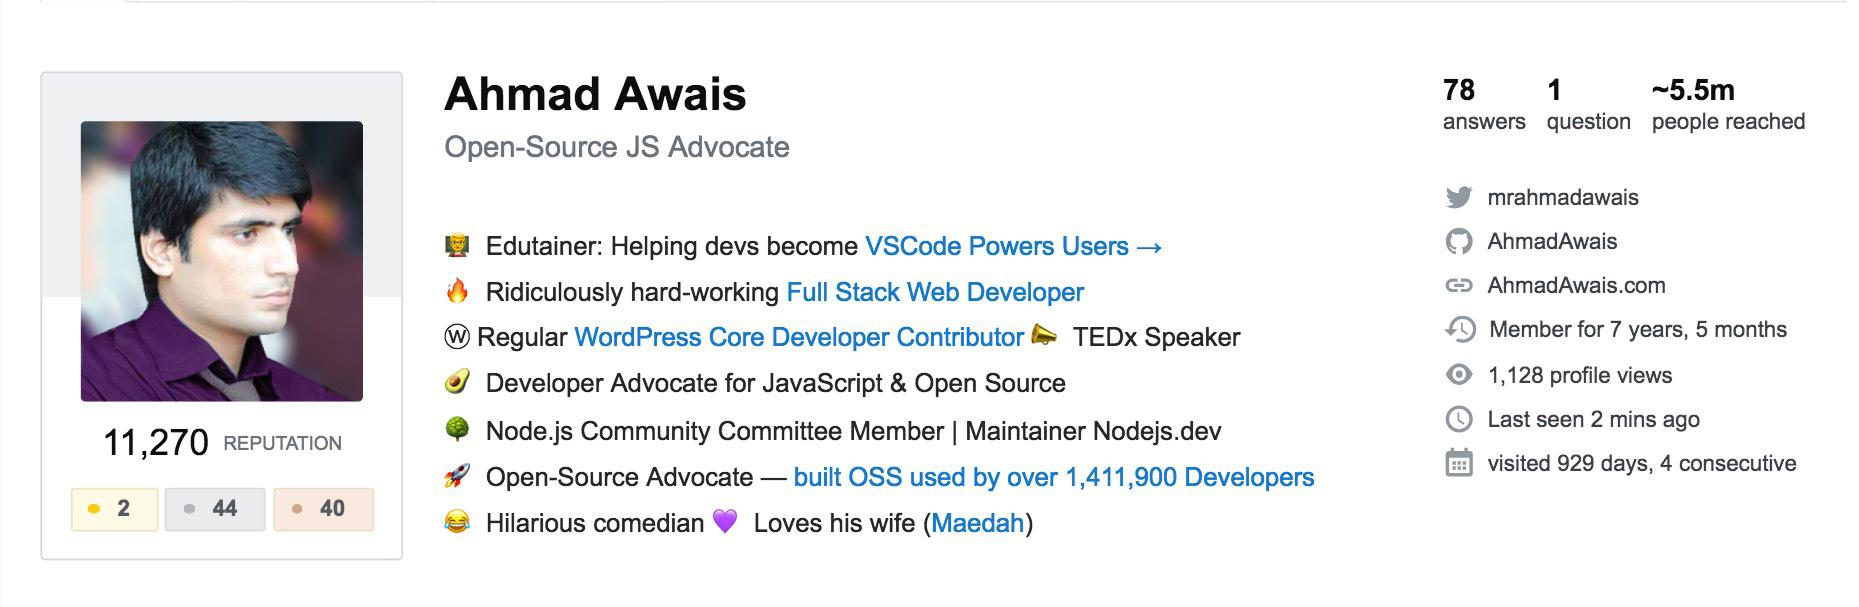 Ahmad Awais 2018 Stackoverflow 5.5mil